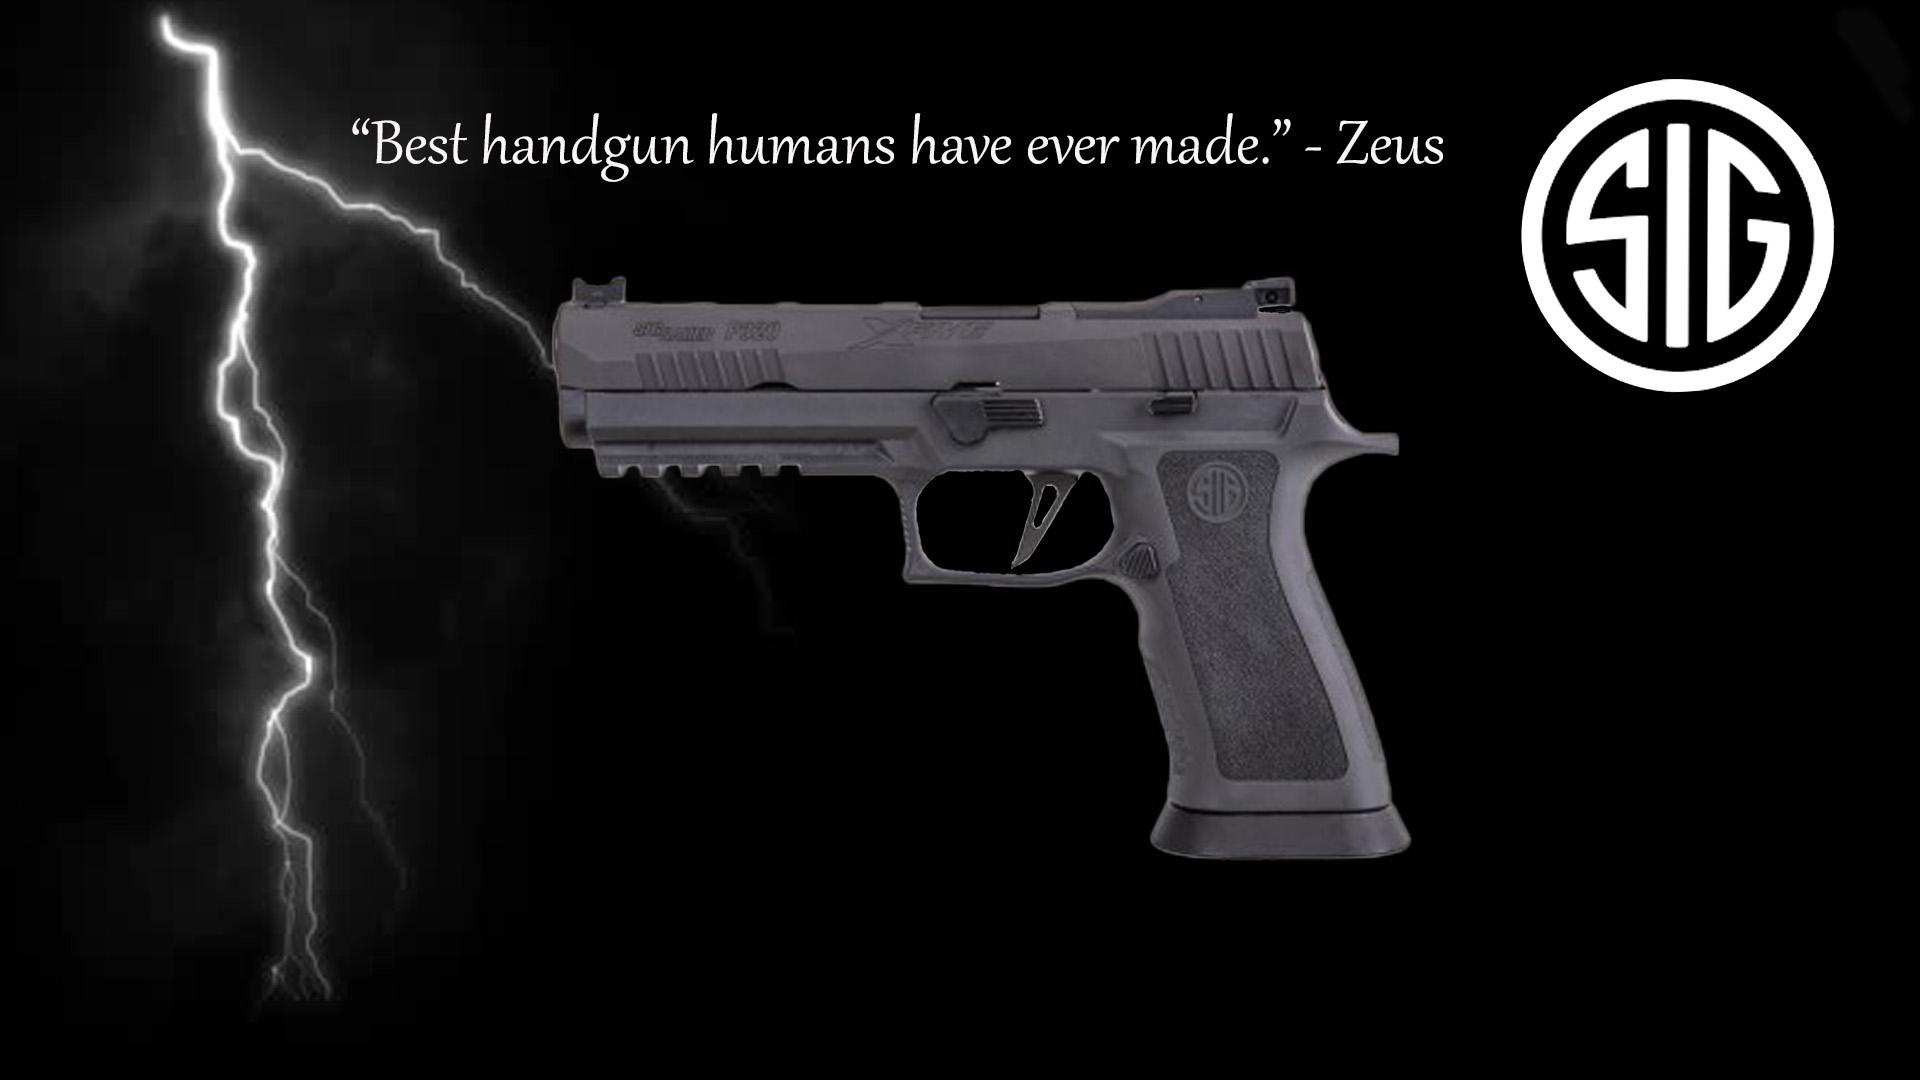 https://shop.athenagunclub.com/catalog/handguns/semi-automatic-handguns?brand_id=664&page=1